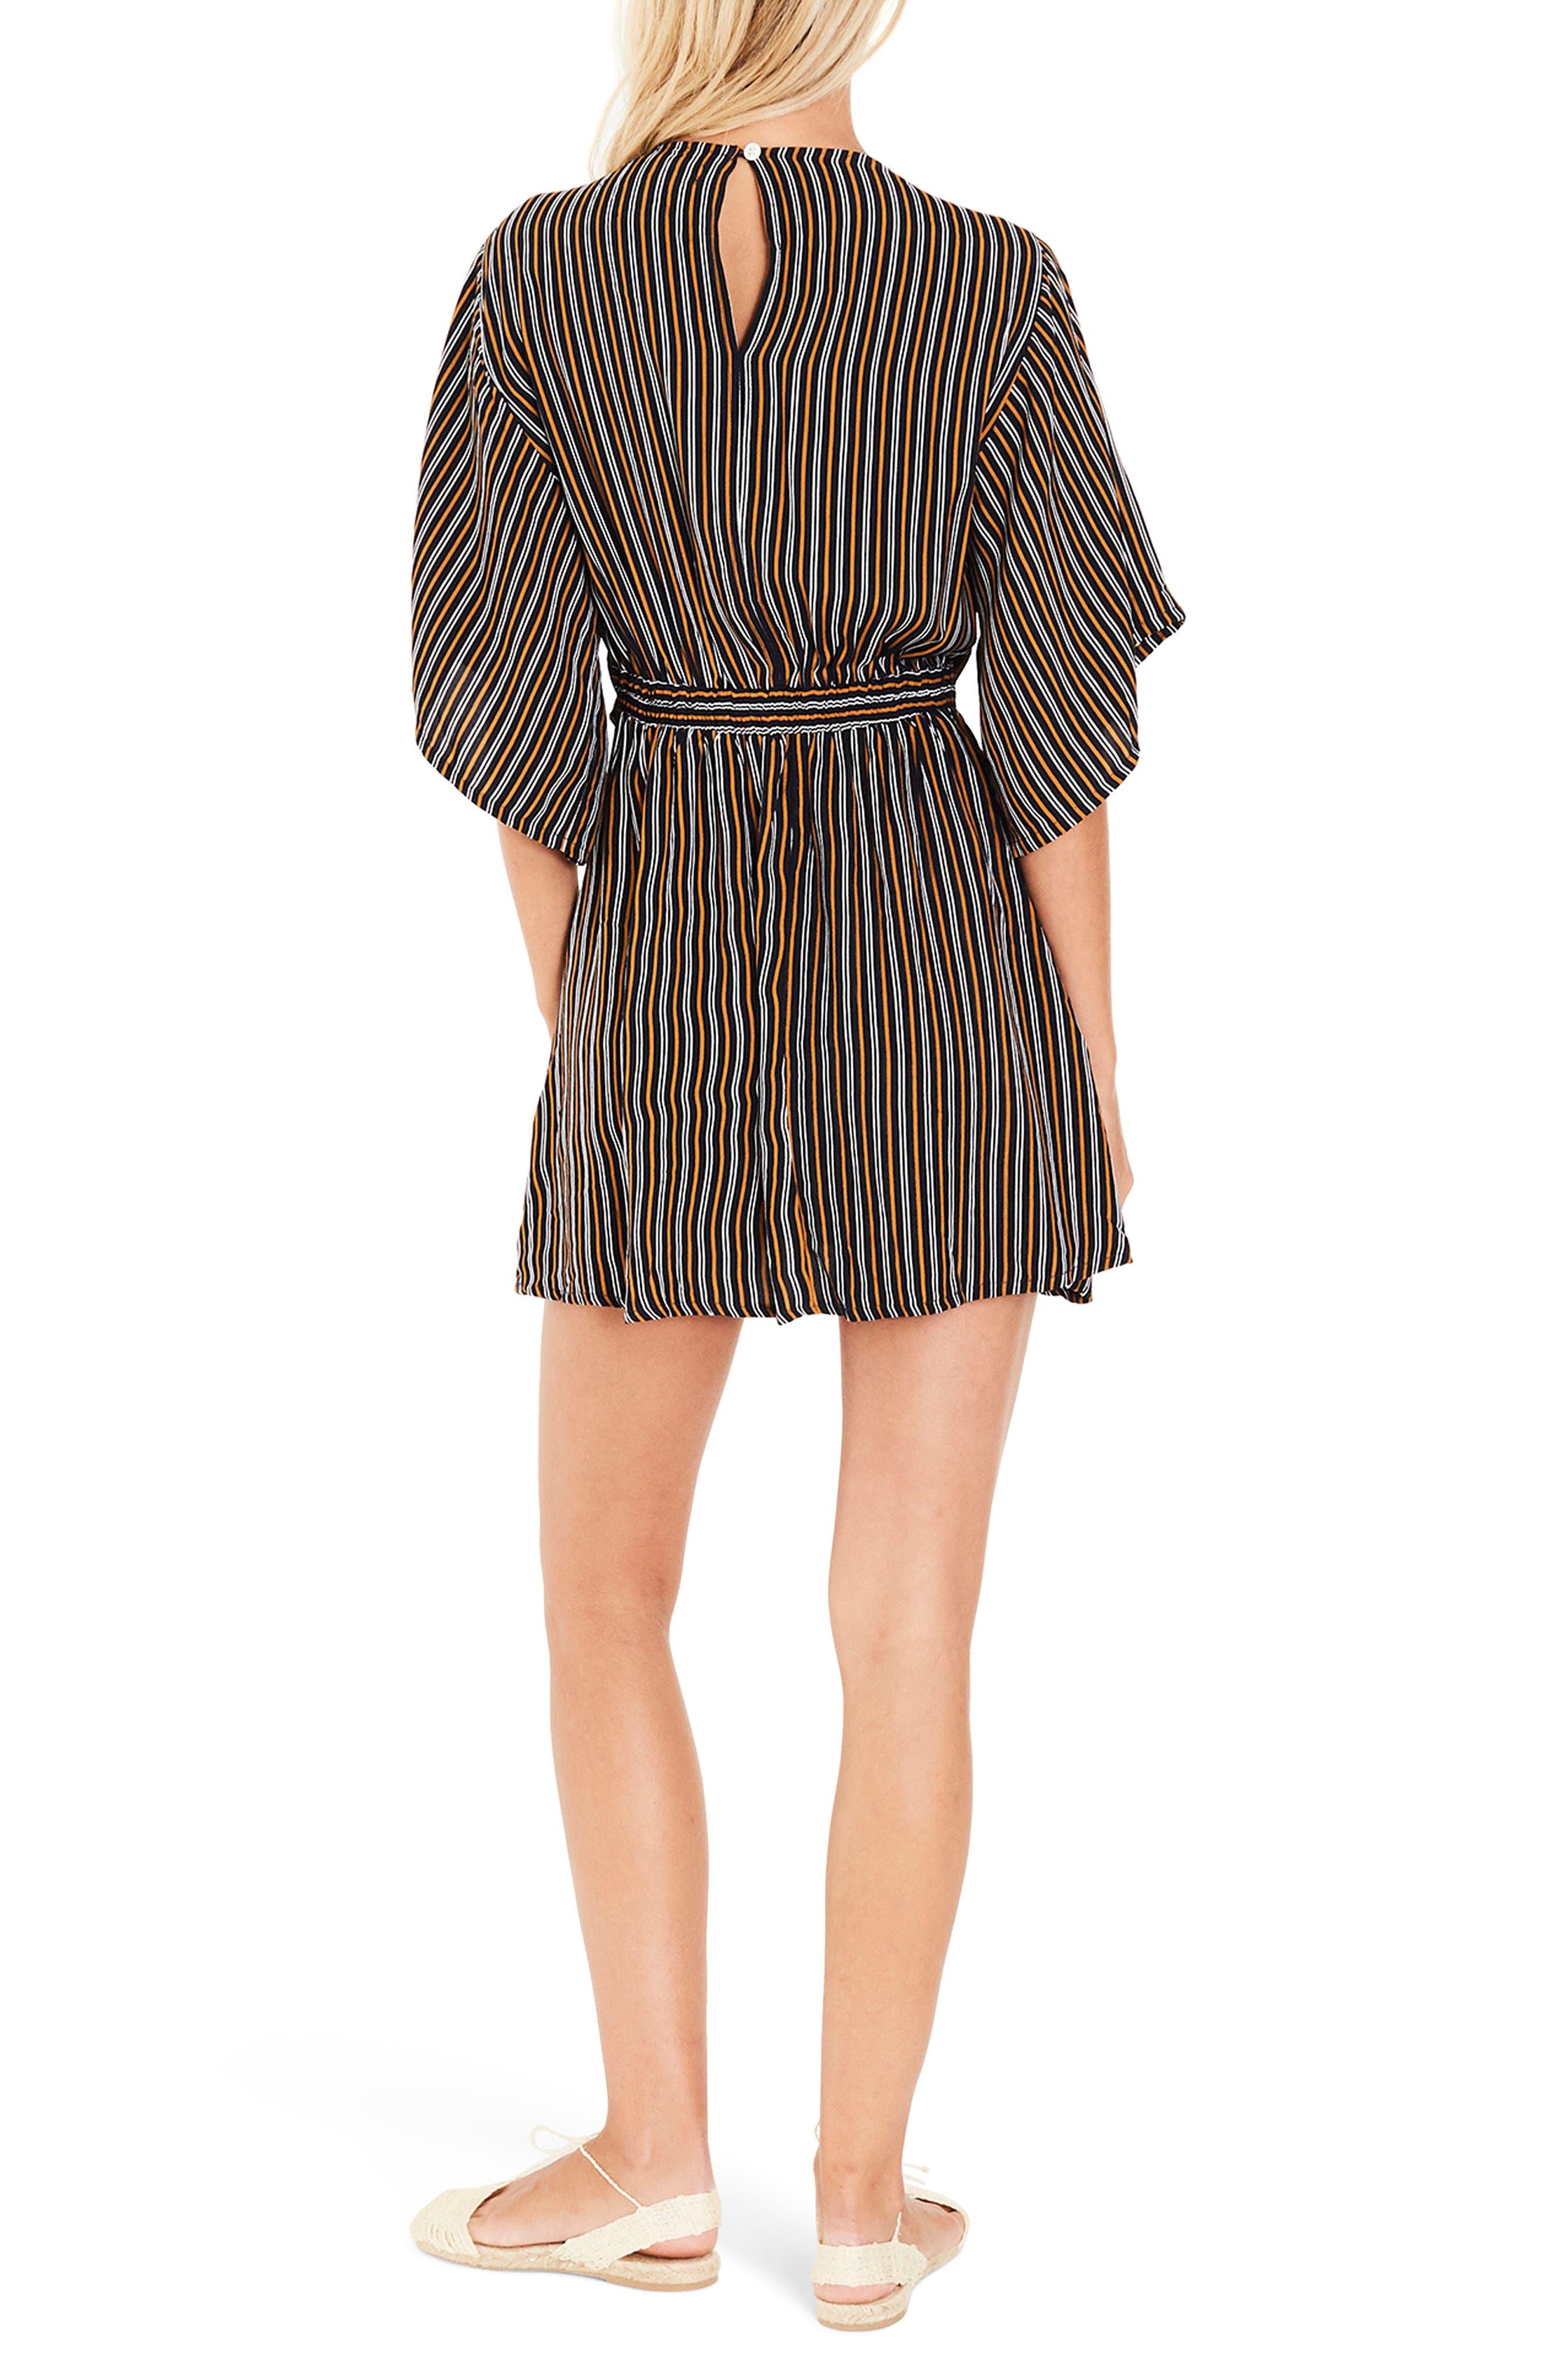 Vinci Stripe Tie Front Dress,                             Alternate thumbnail 3, color,                             Glasgow Stripe Print